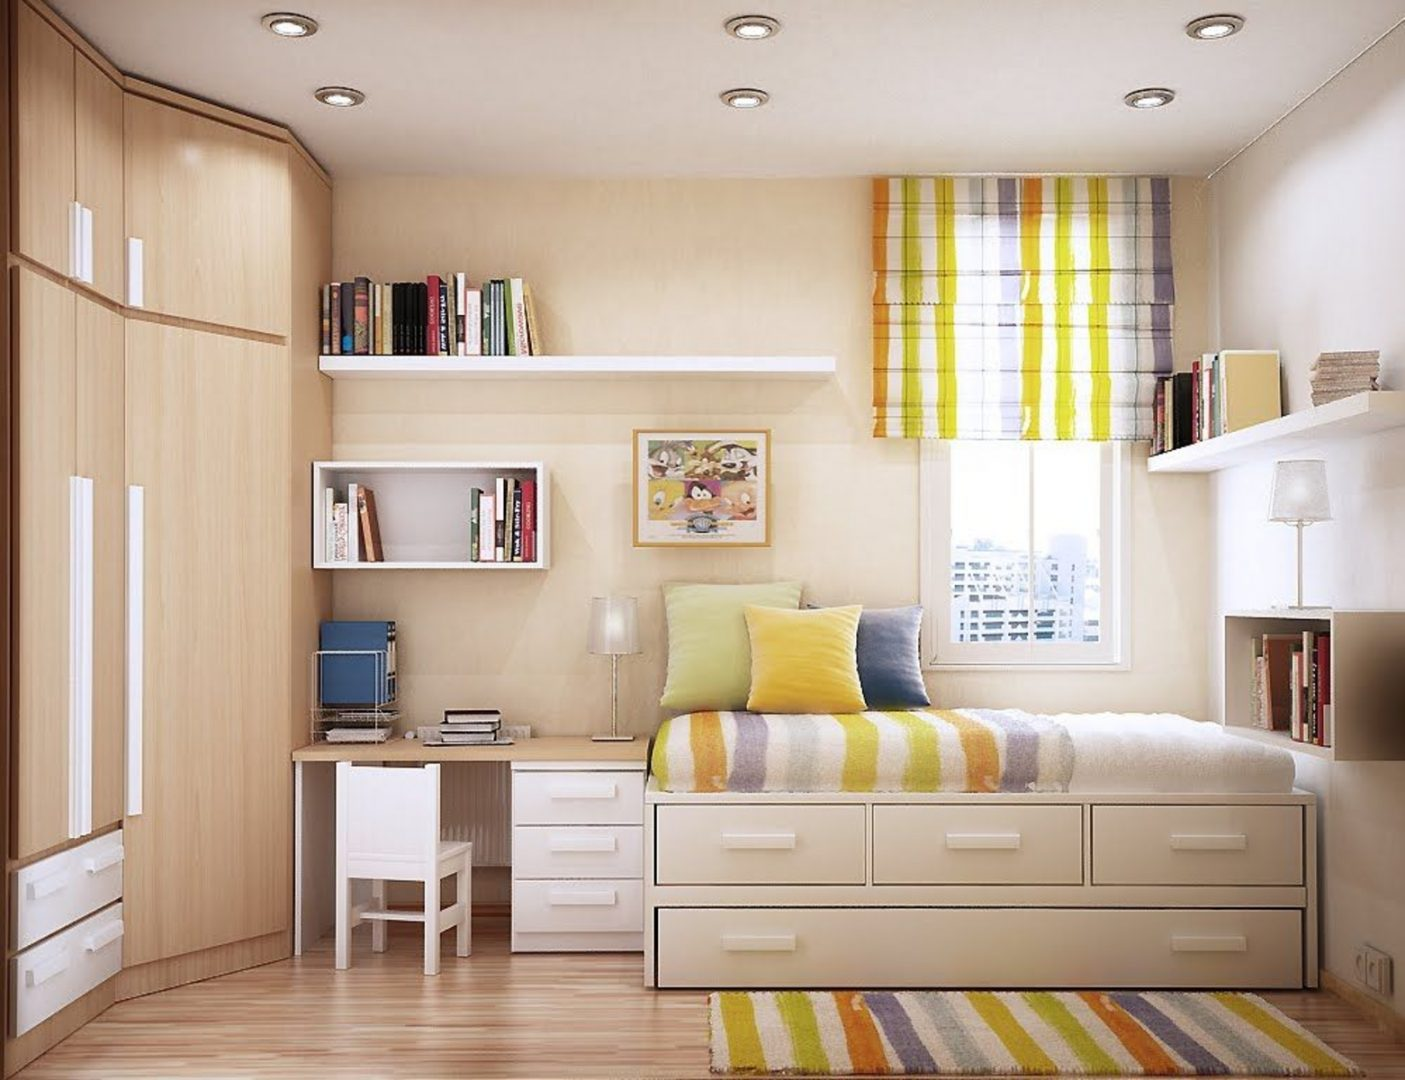 Decoraci n de una habitaci n juvenil im genes y fotos - Decoracion de habitacion juvenil ...